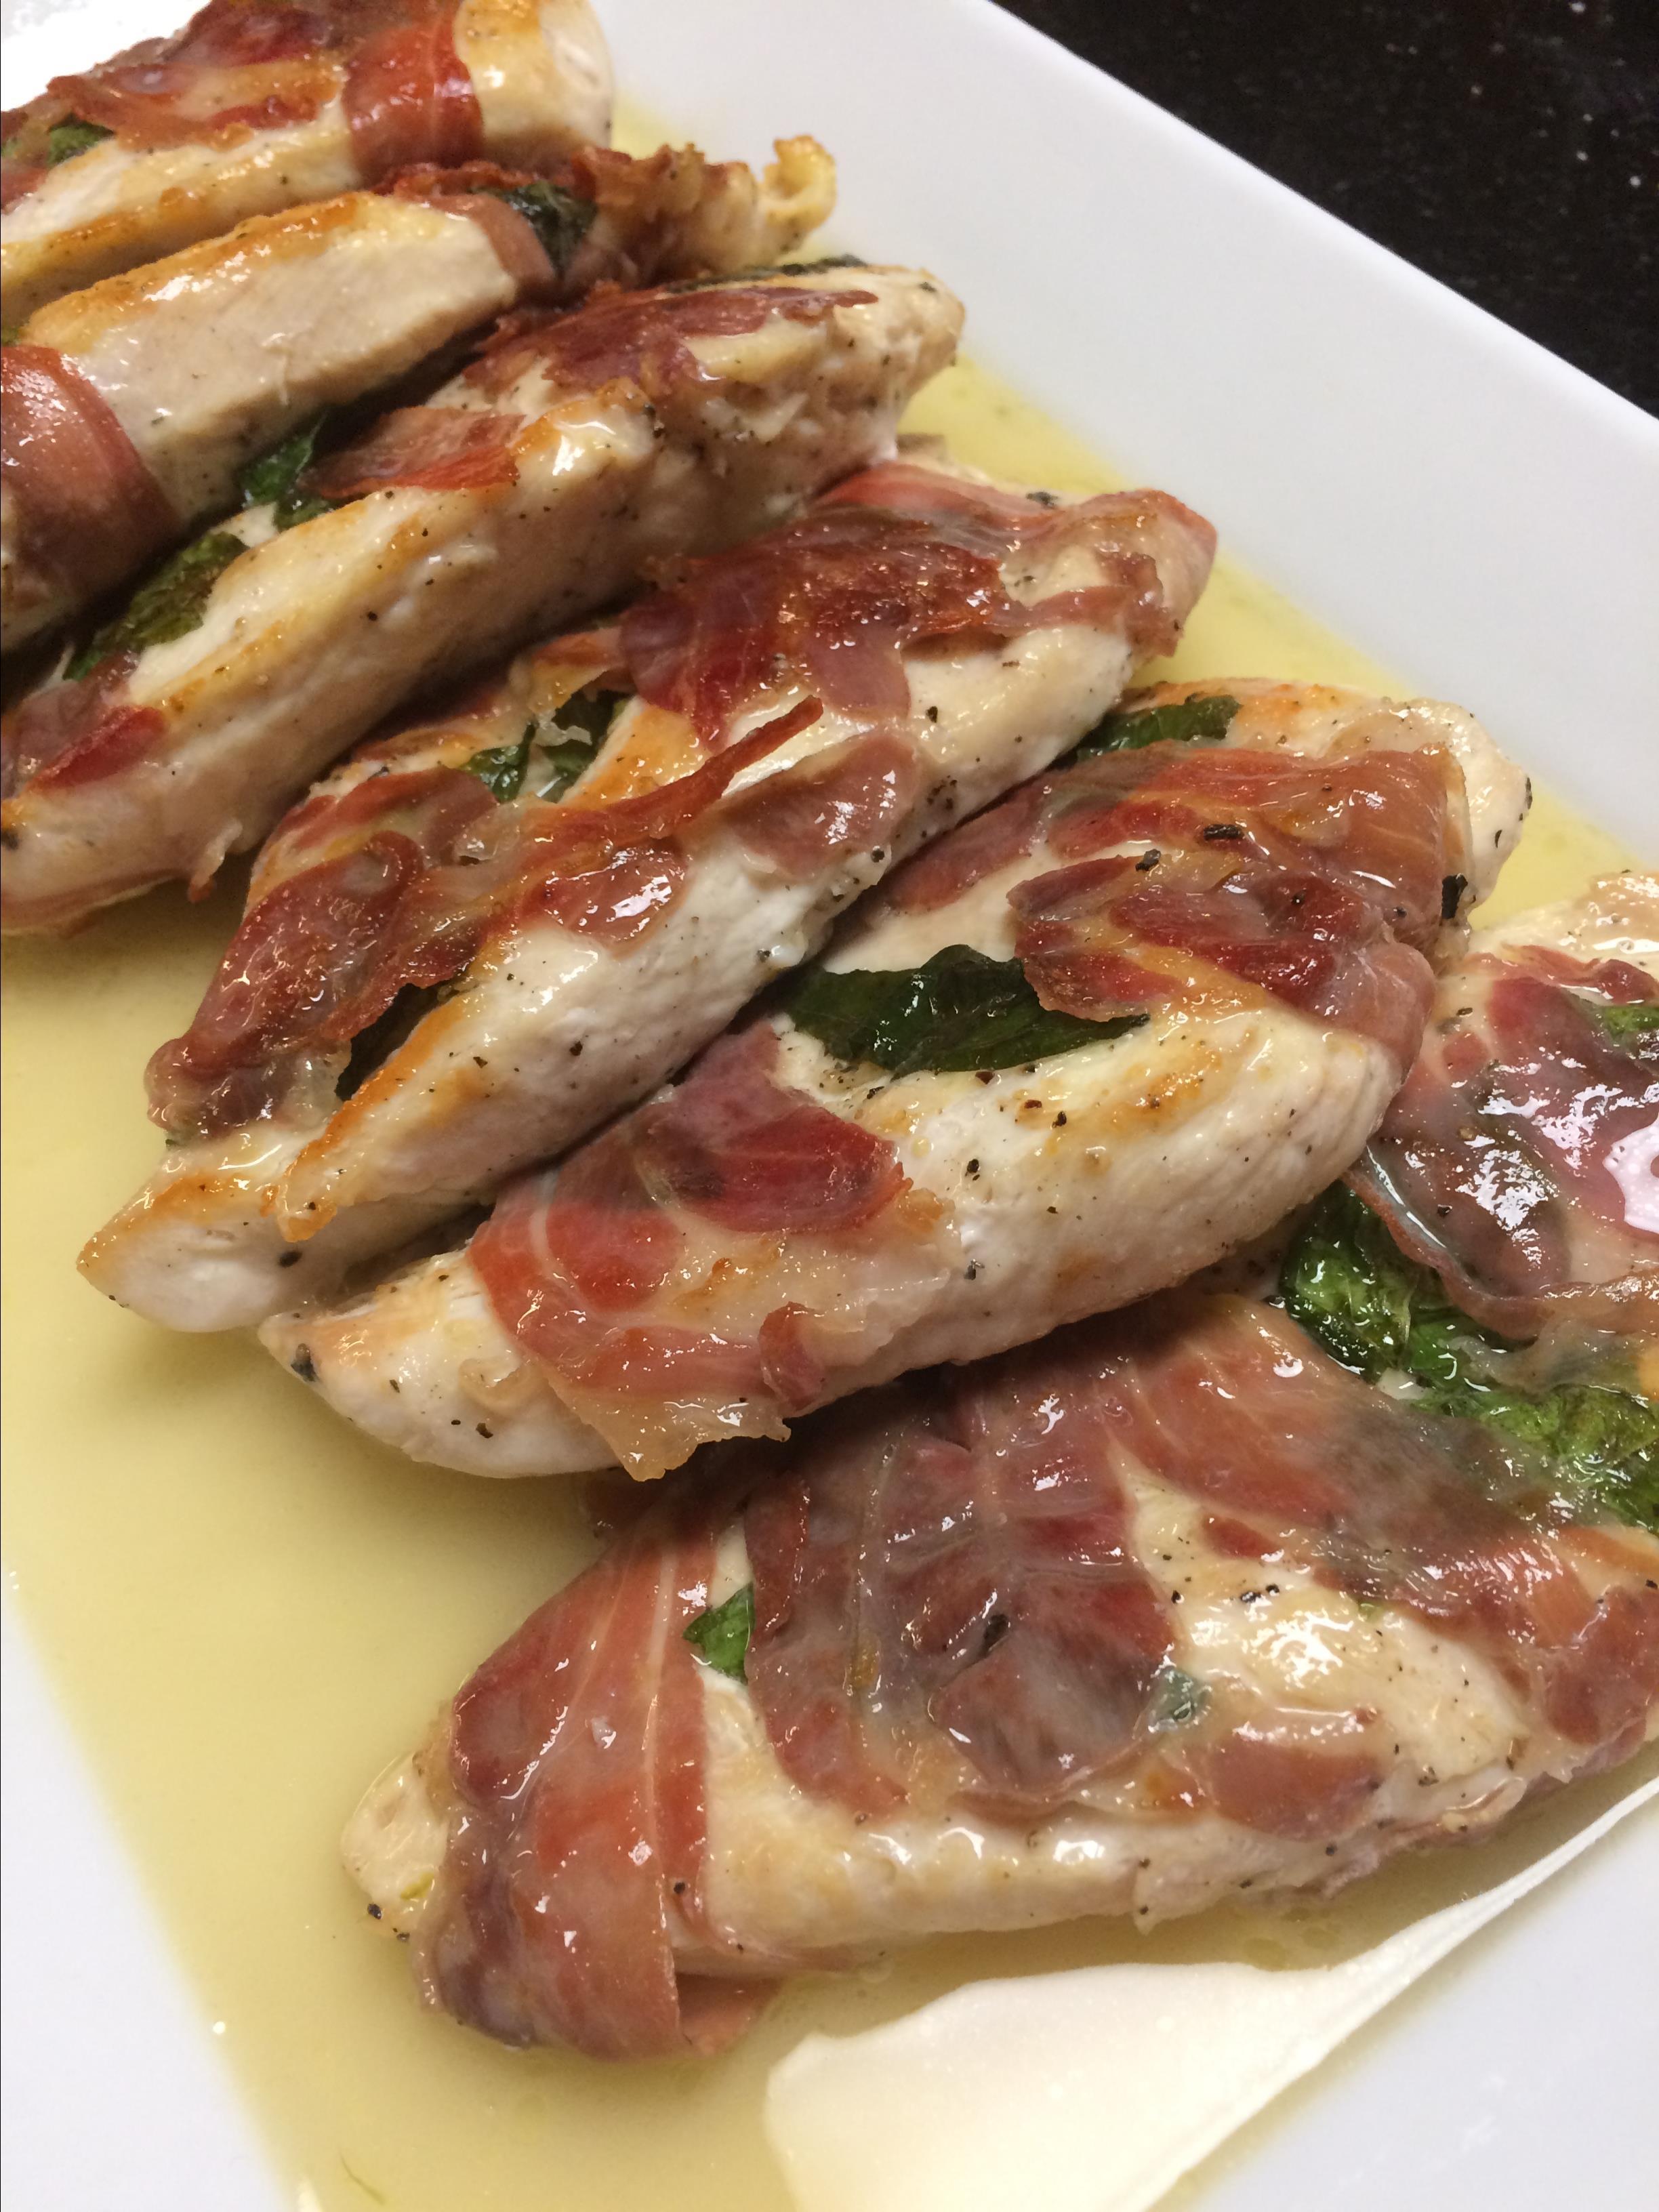 Sandy's Chicken Saltimbocca